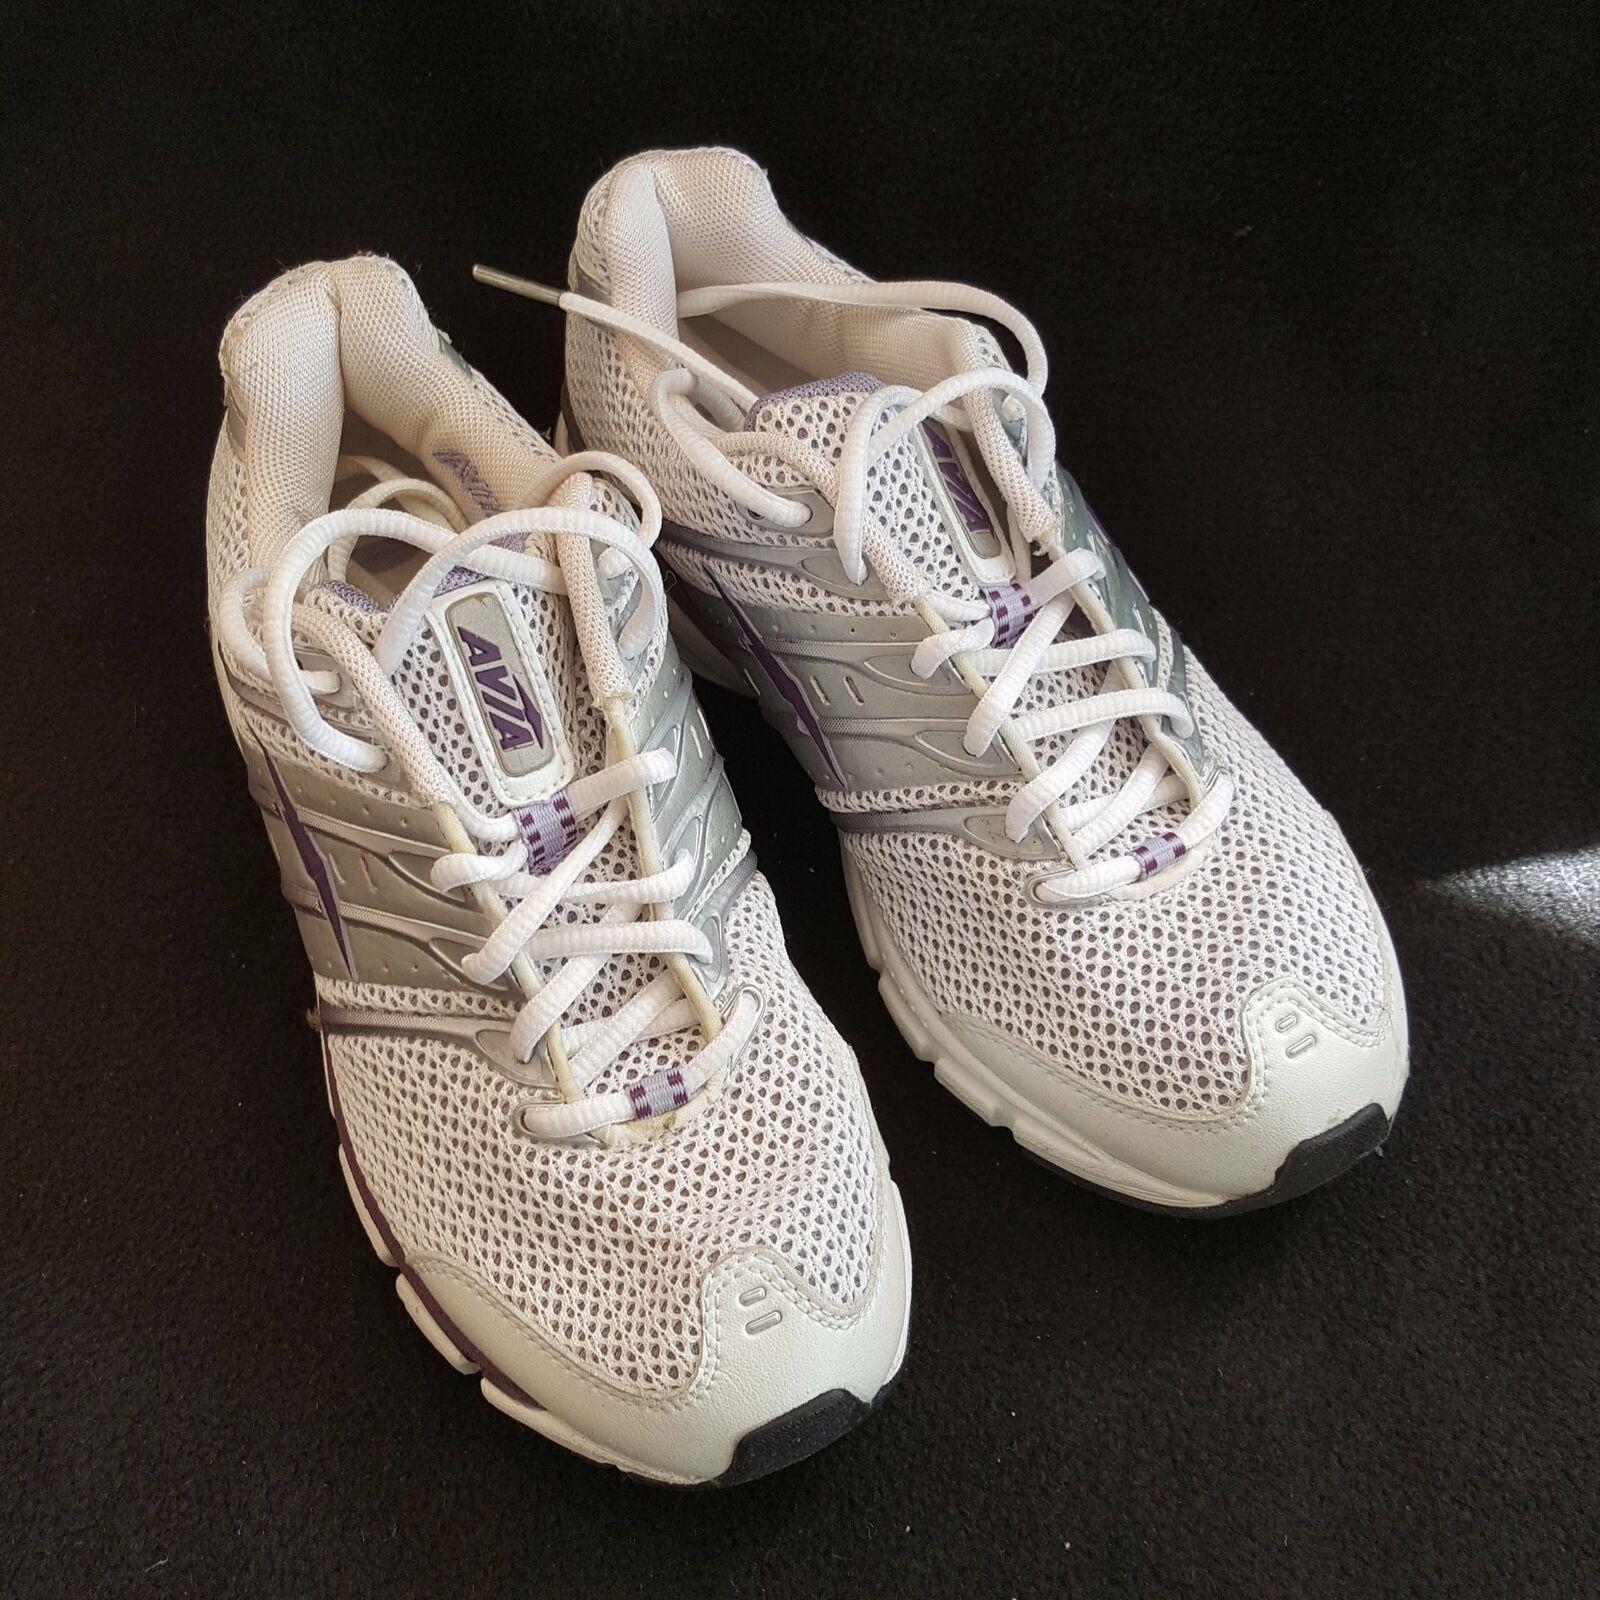 Avia Women's Running shoes Art Elite White Silver Purple Plum Sneakers Sz 6M New